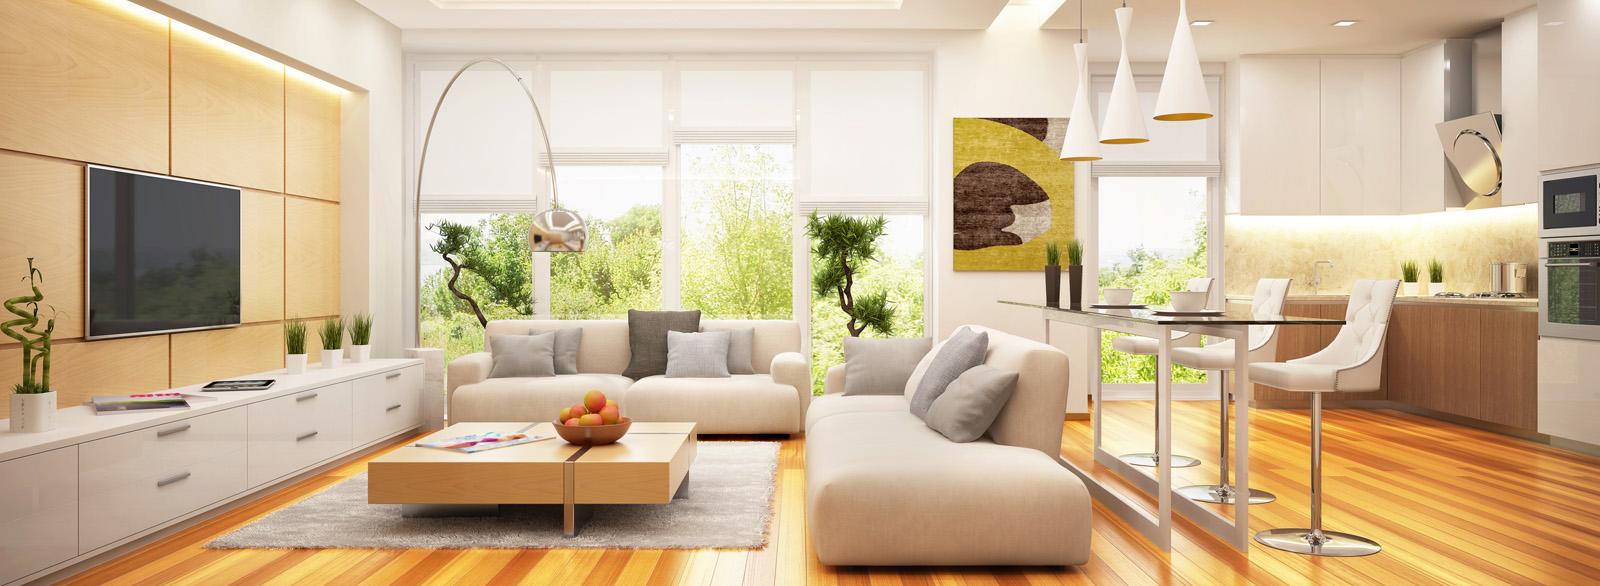 curso de experto online en dise o de interiores para On estudiar decoracion de interiores online